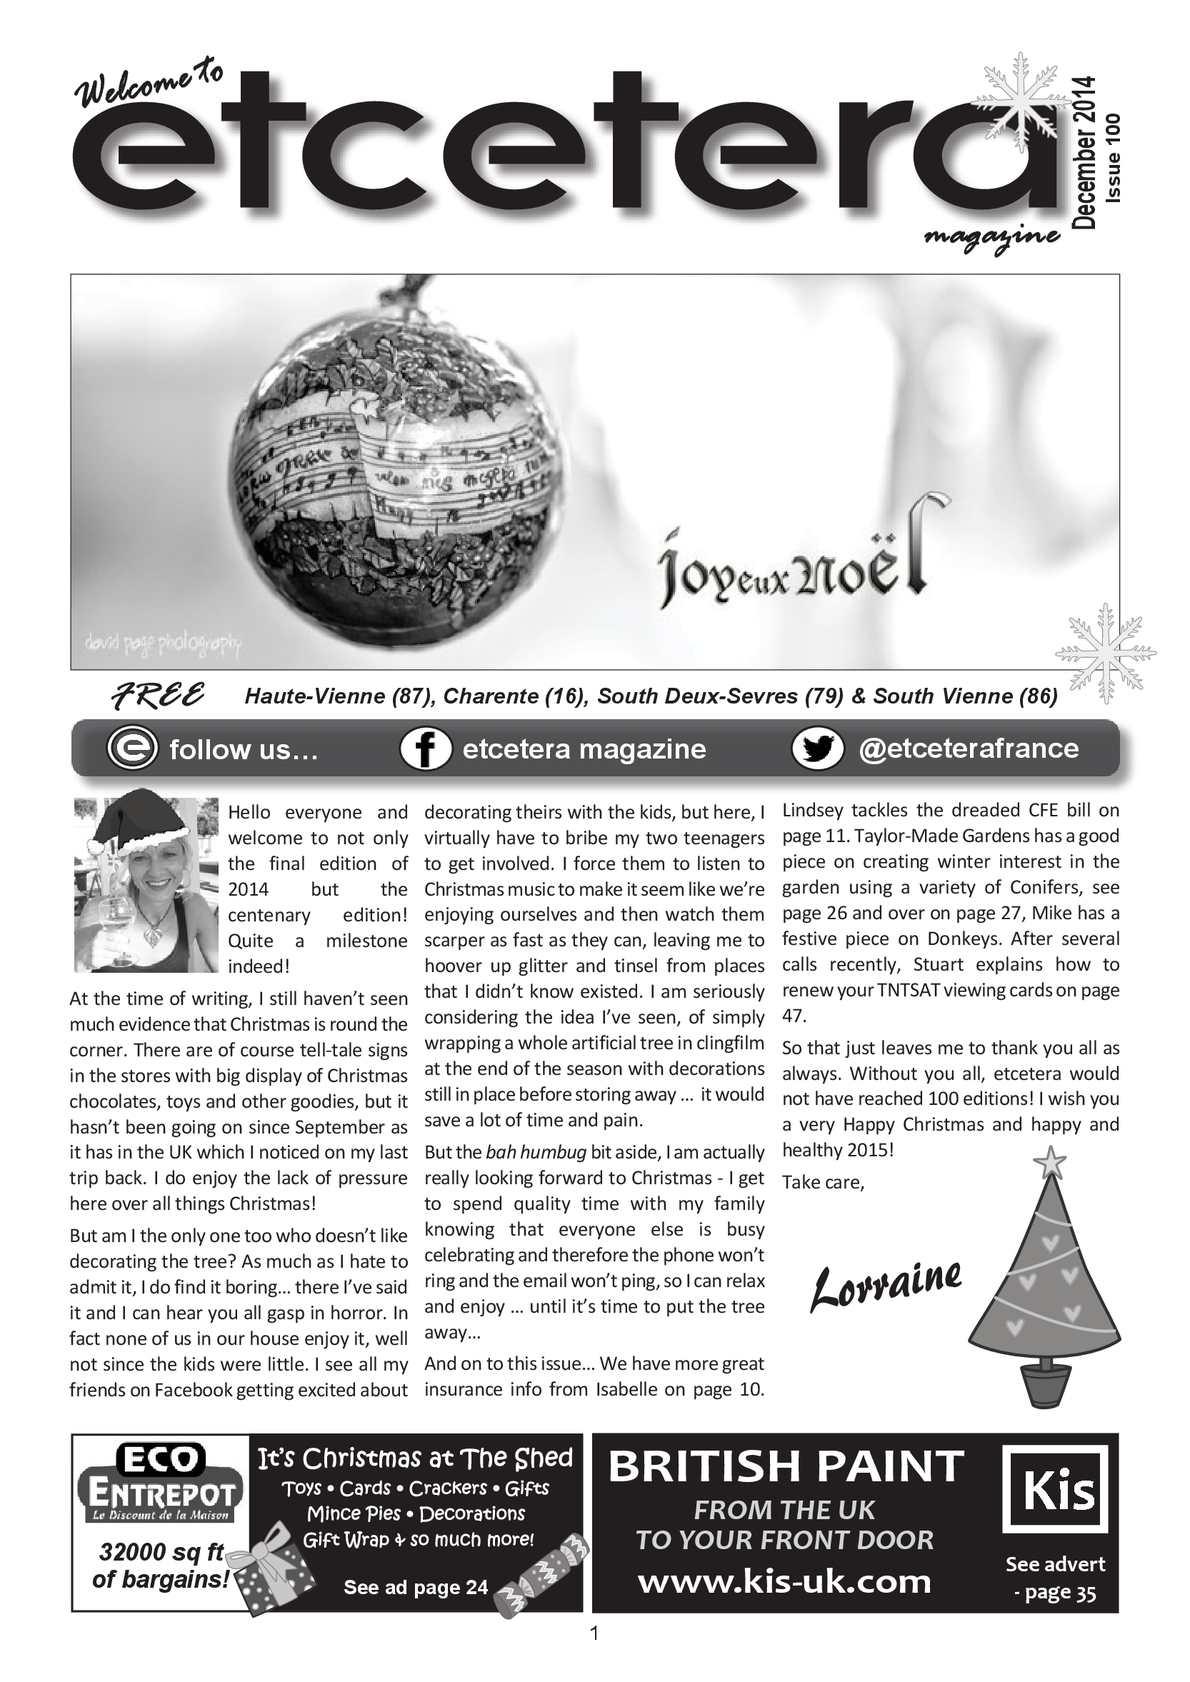 Merry xmas Karl mini coeur Tin Cadeau Joyeux Noël Stocking Filler